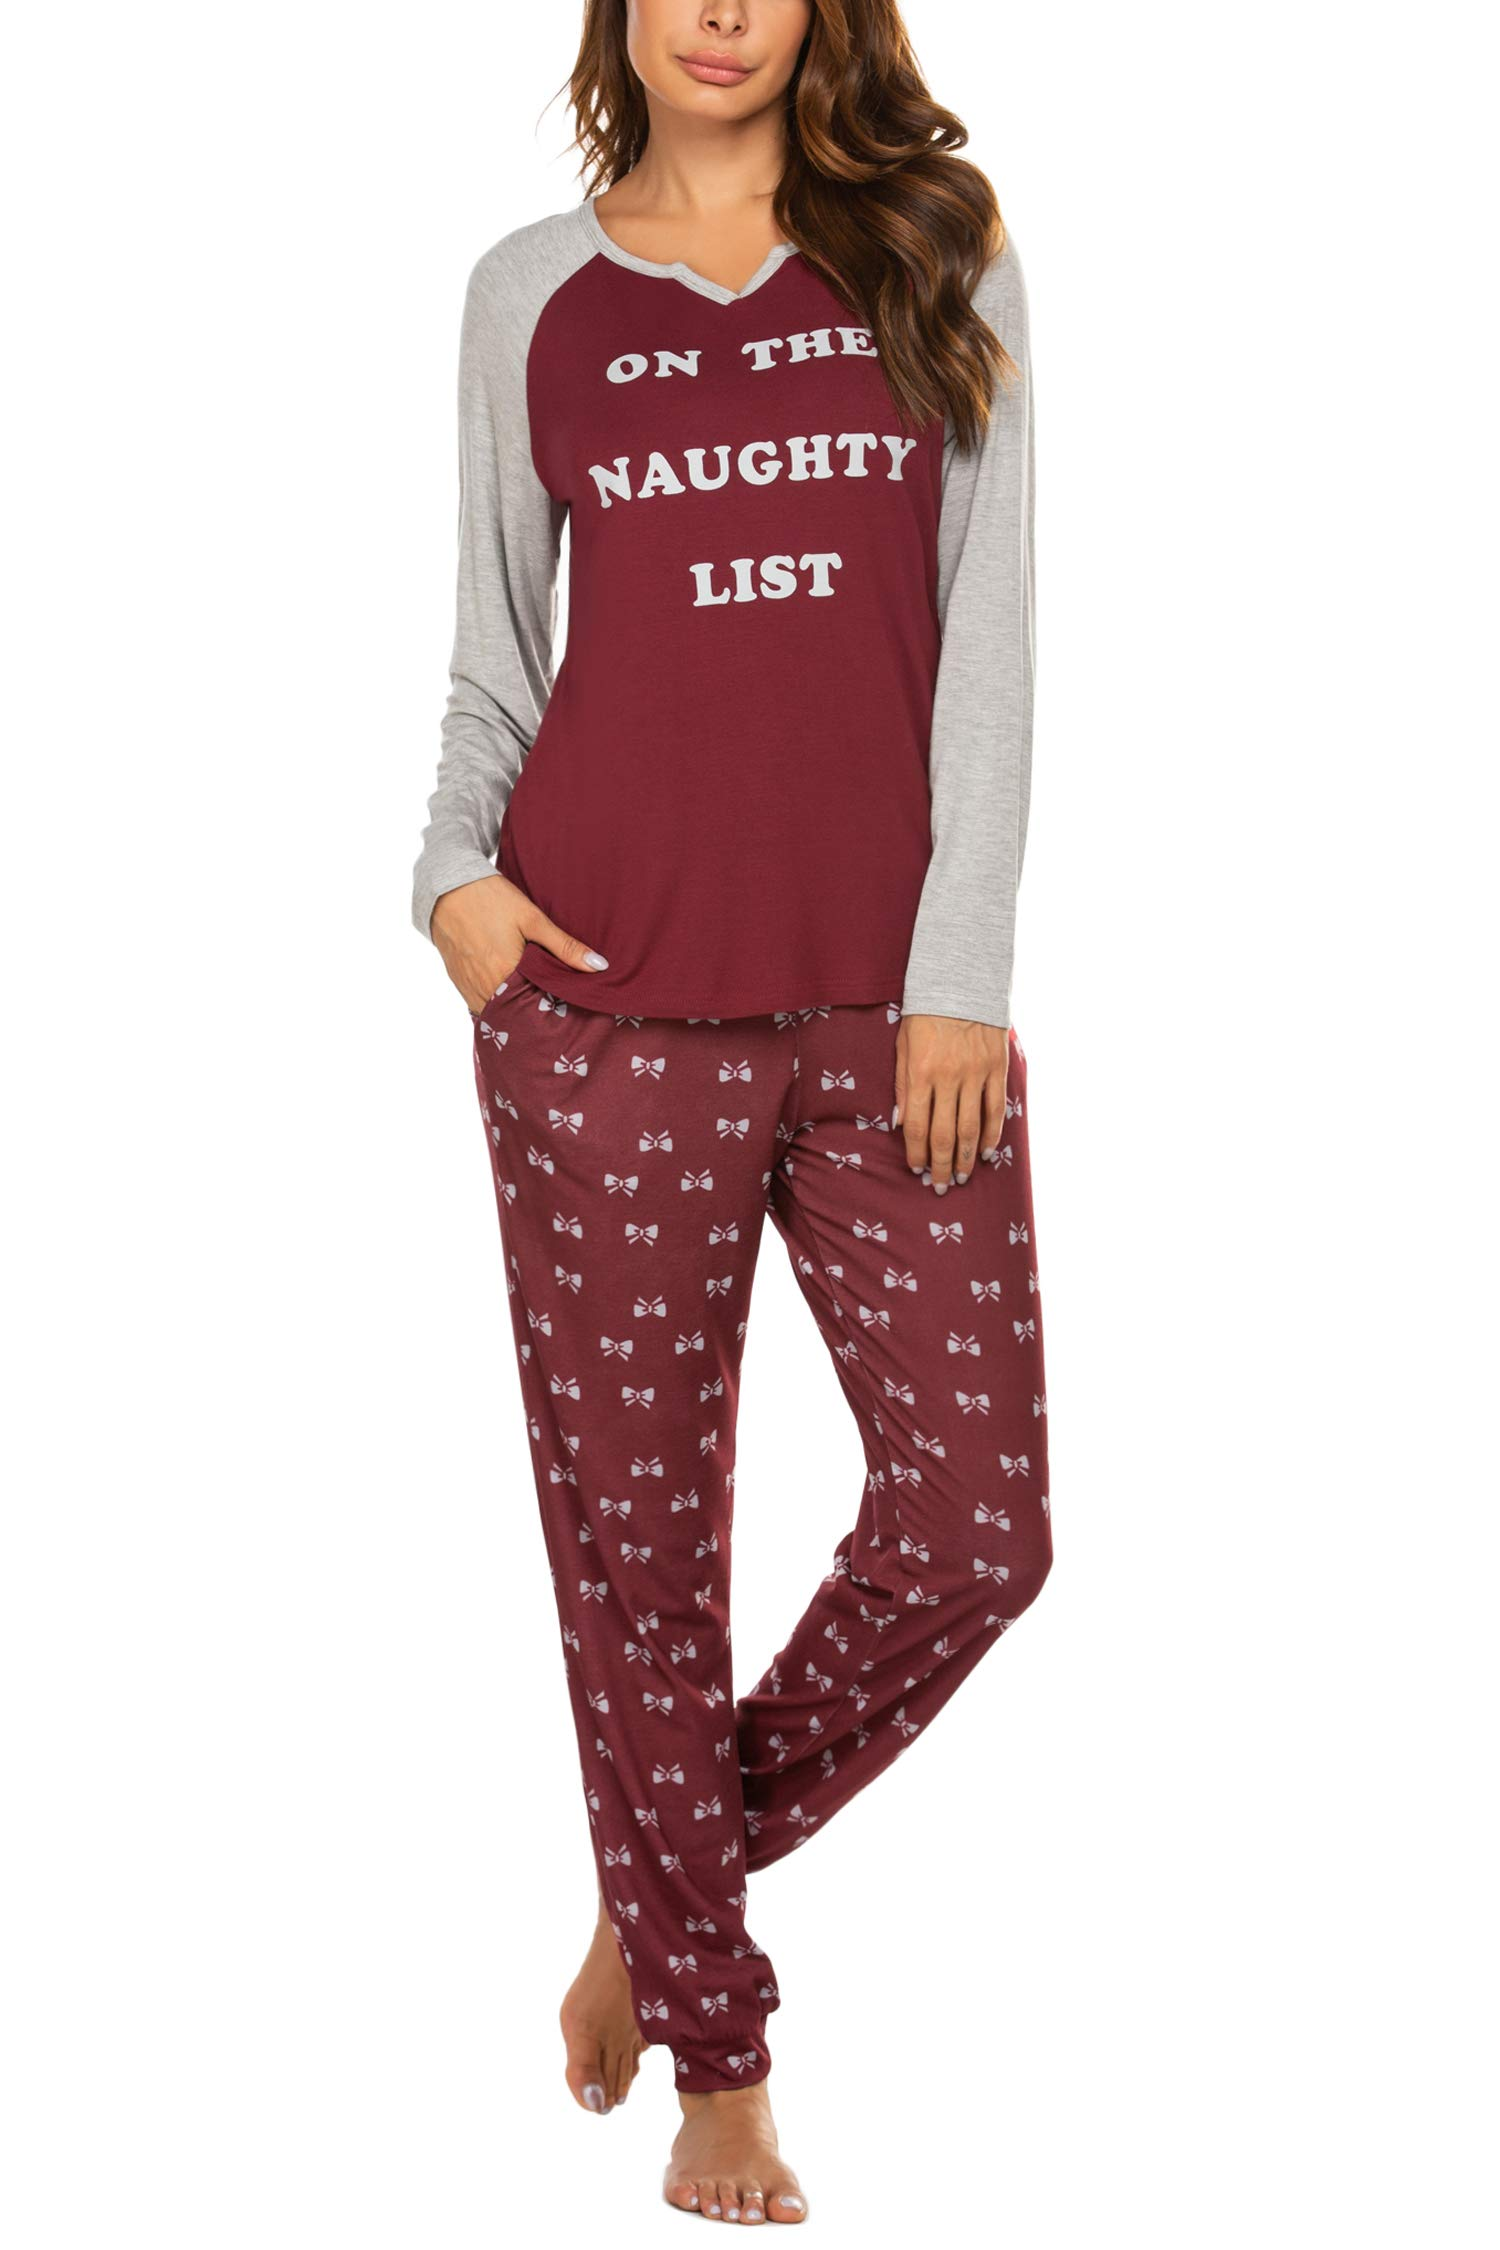 Ekouaer Women's Pajamas Set Long Sleeve Raglan Shirt and Pants Pj Lounge Set Print Sleepwear